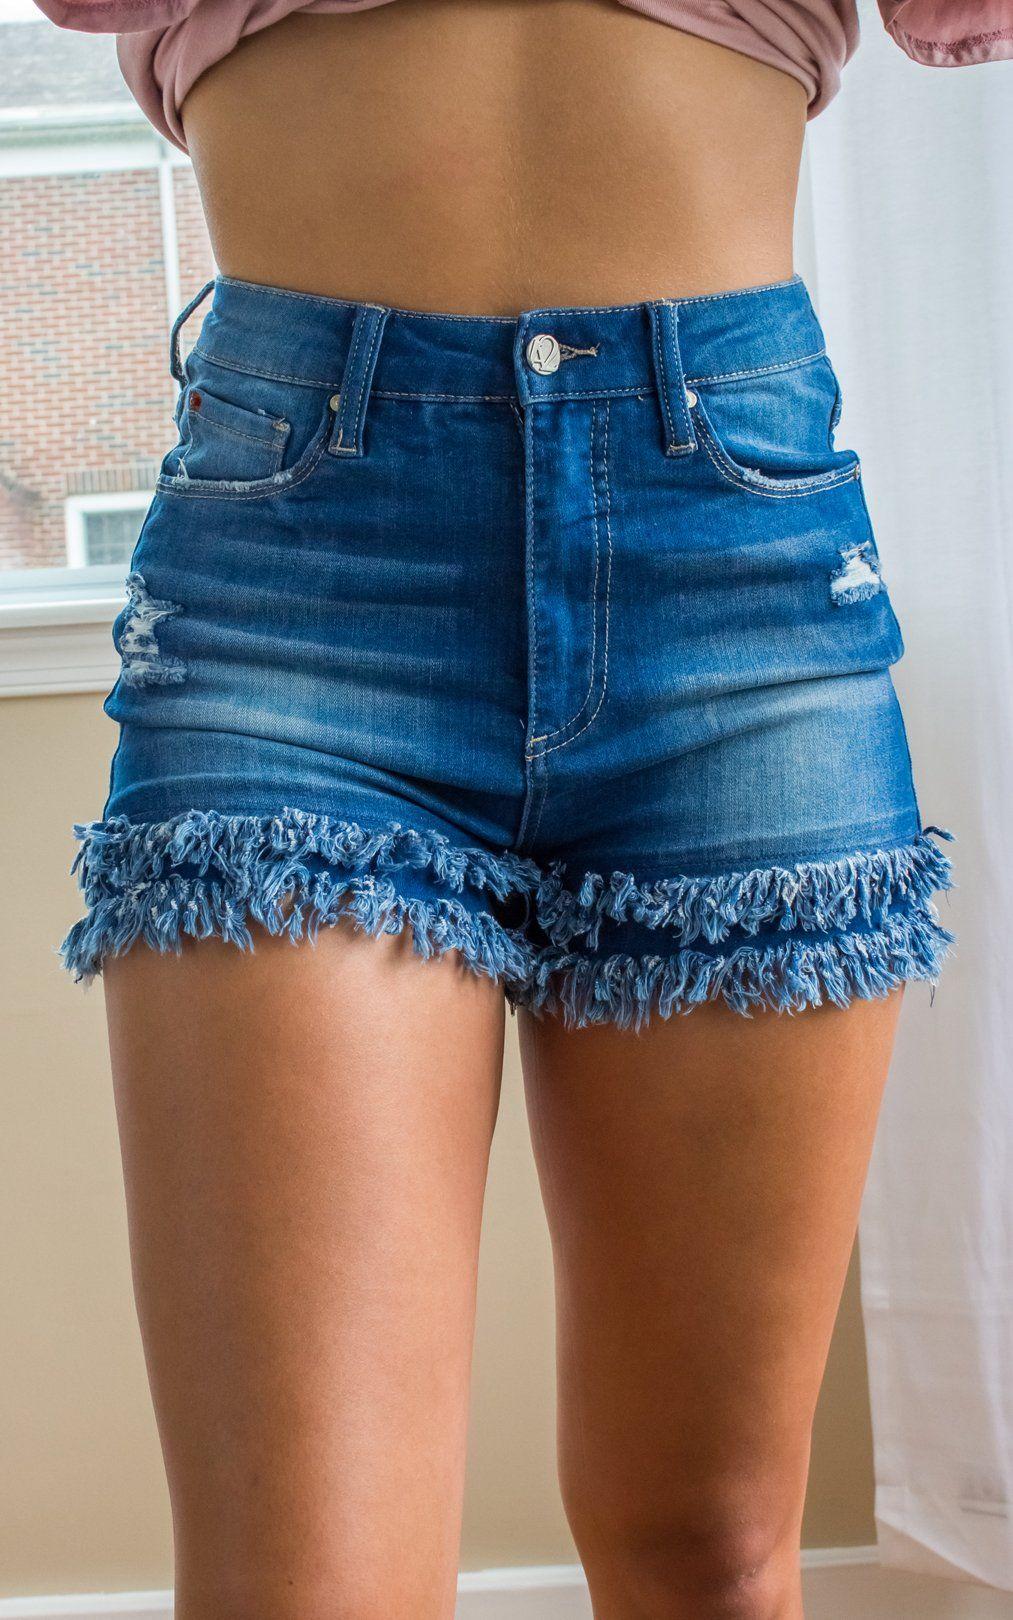 866a0b609733 Double Vision Fringe Shorts (Medium Wash) en 2019 | pantalon | Ropa ...